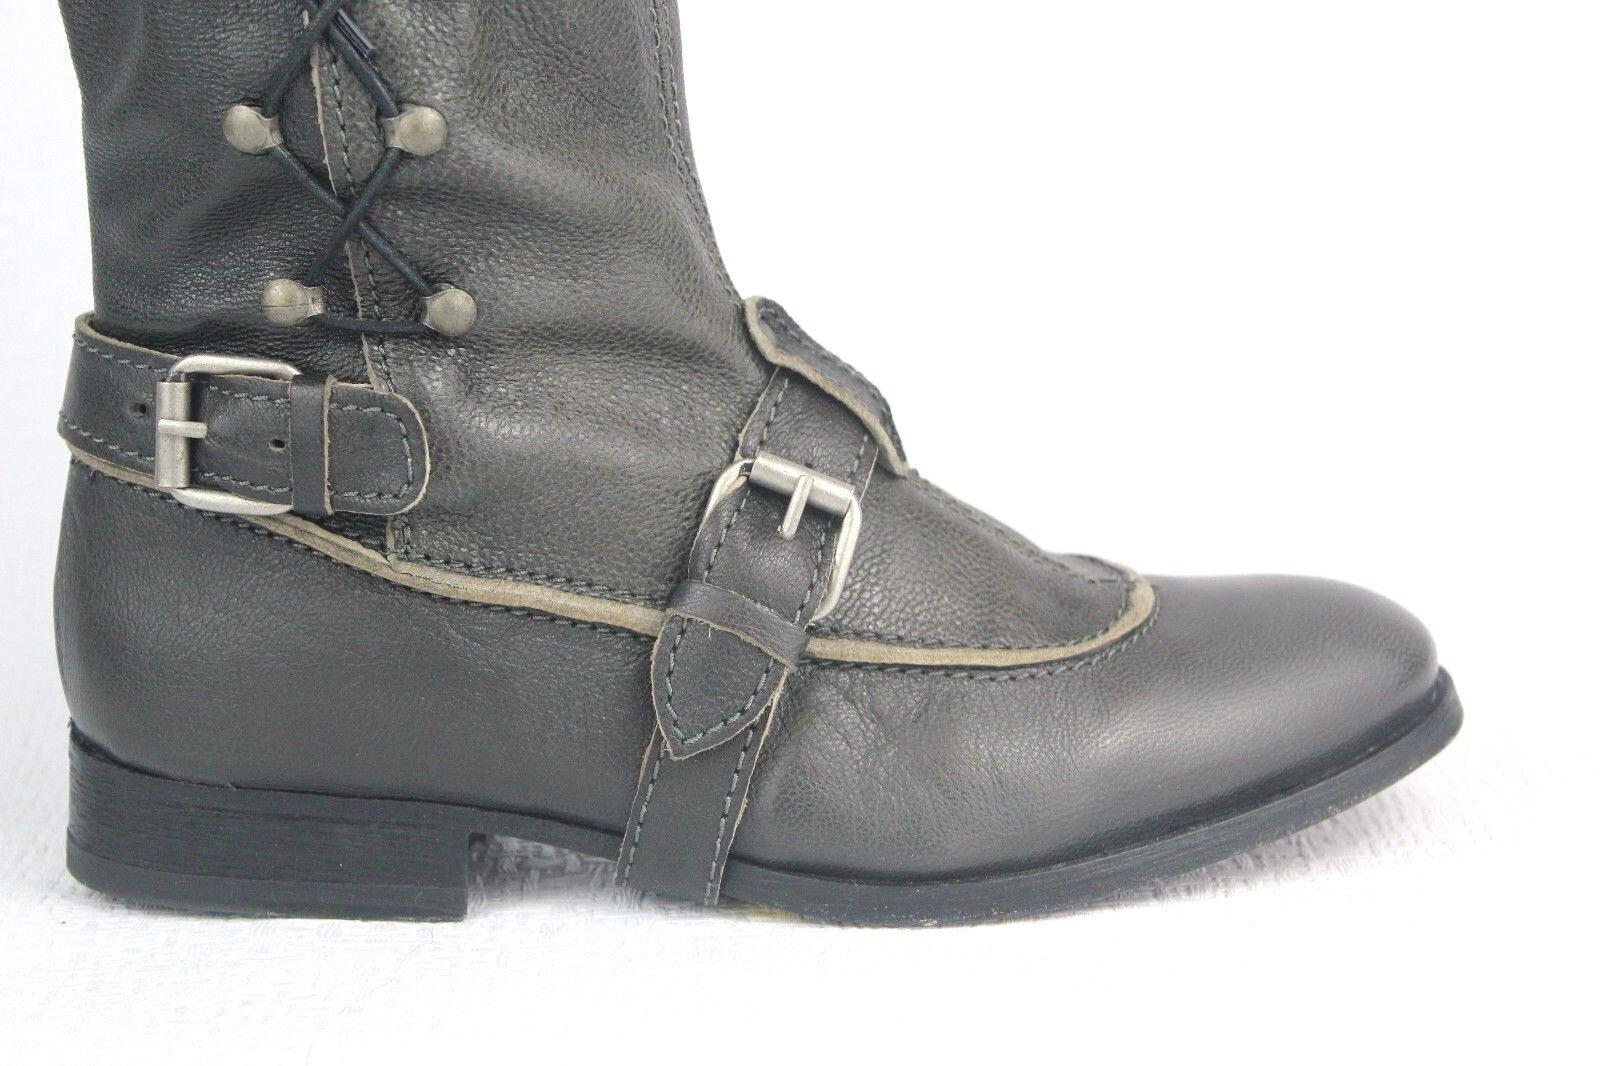 J.LITVACK Bleecker Motorcycle Womens Leather Grey Boots Size 38